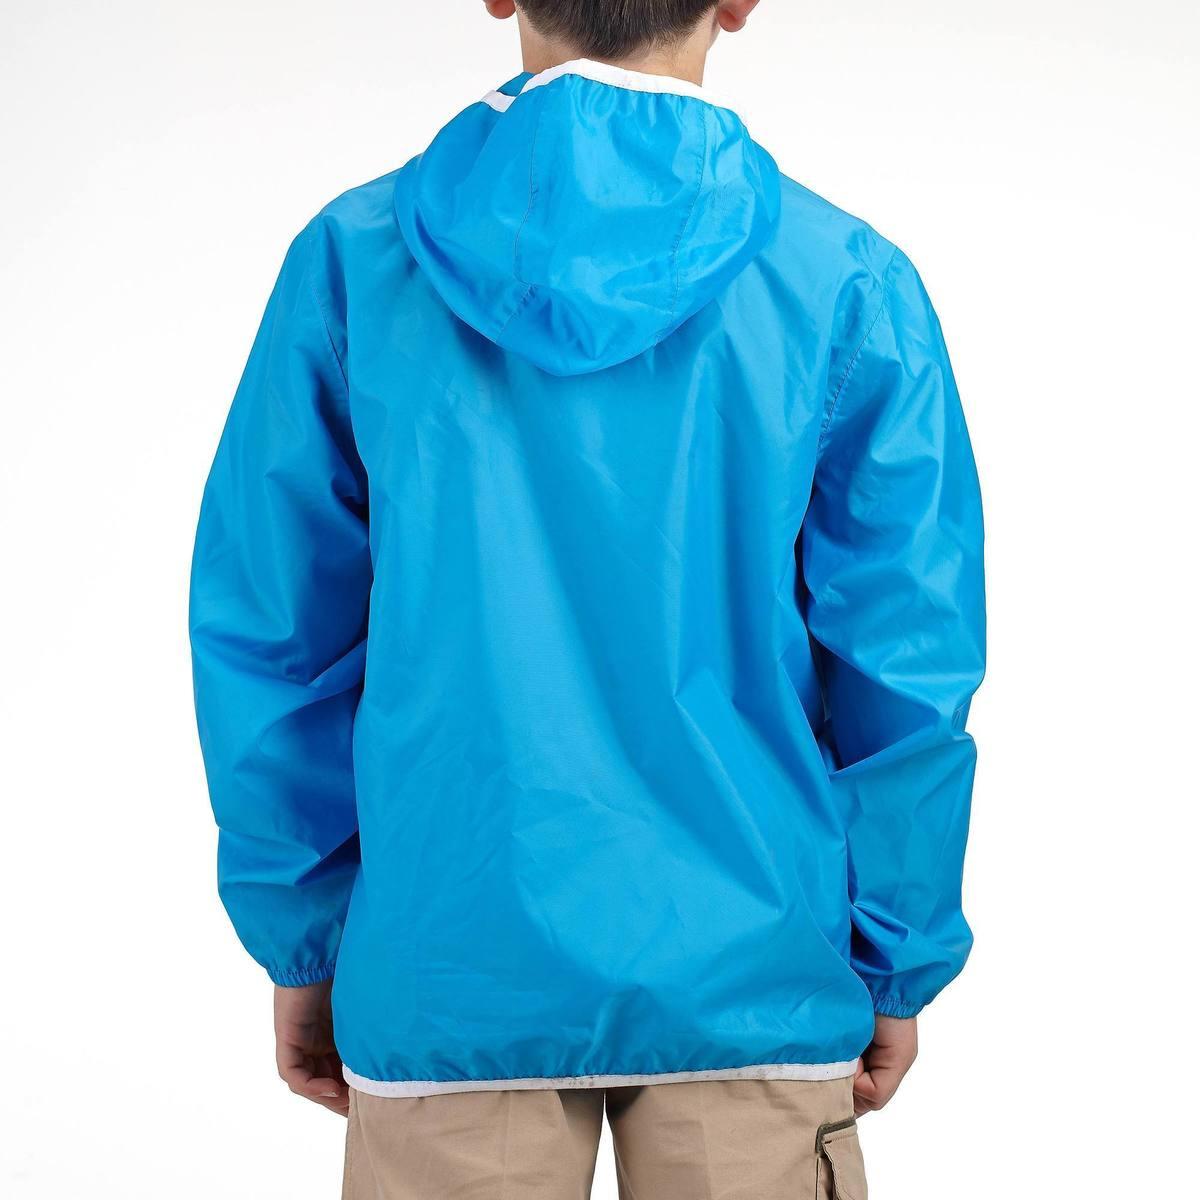 Bild 5 von Wanderjacke Hike 100 Kinder blau